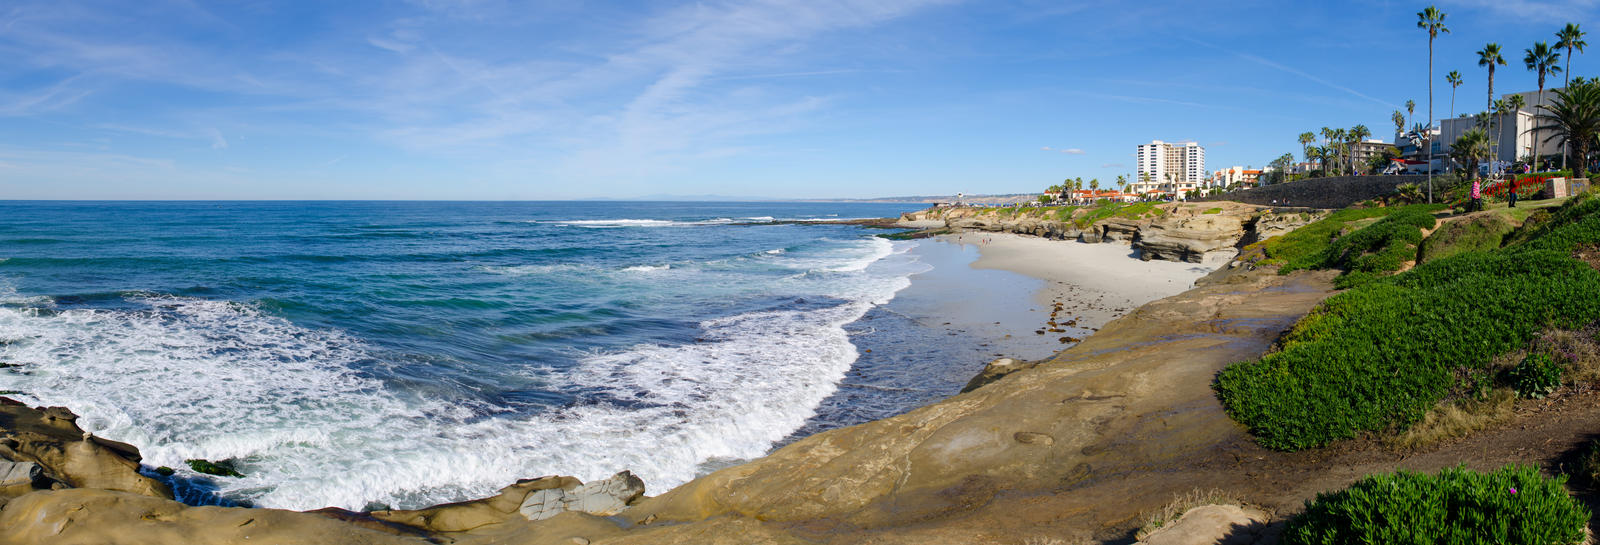 La Jolla Beach Hotels